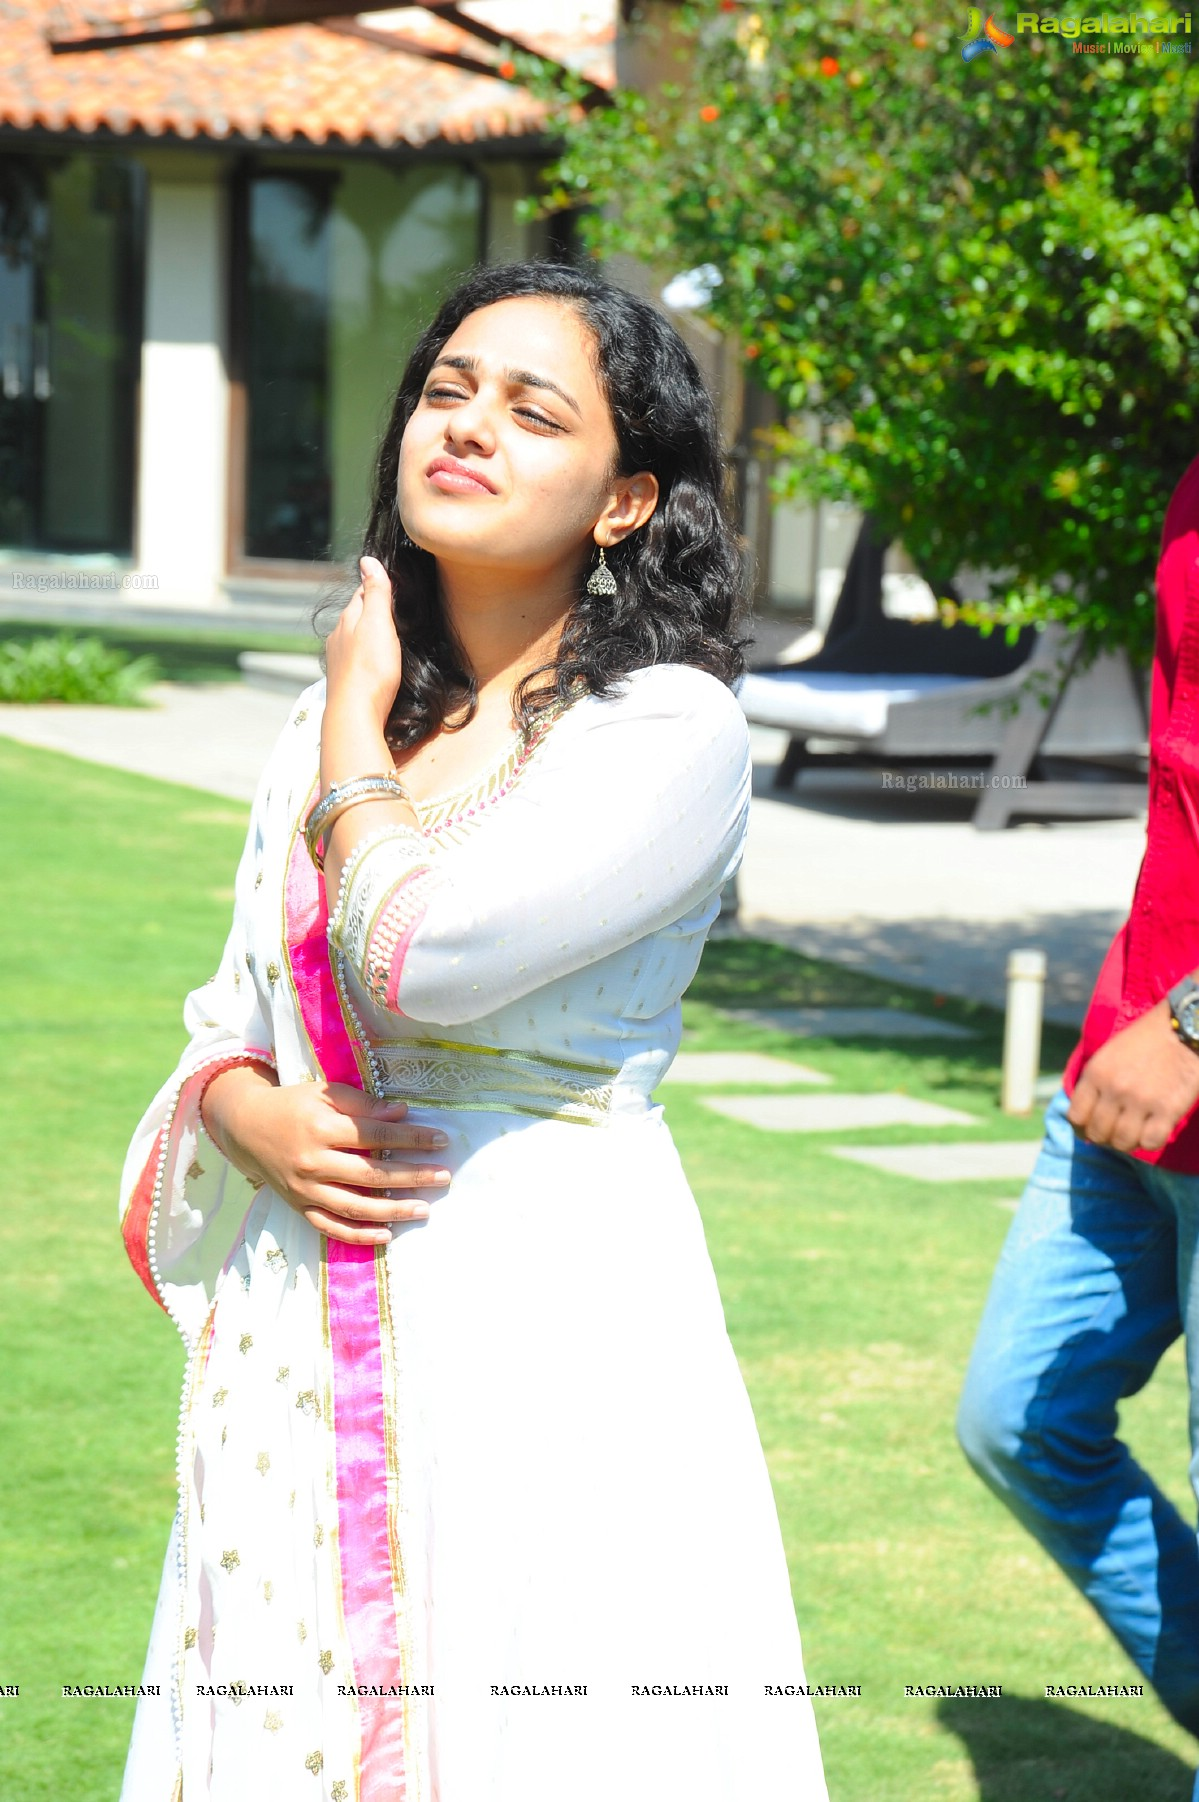 nithya menen image 56 | telugu actress hot photos,stills, heroines